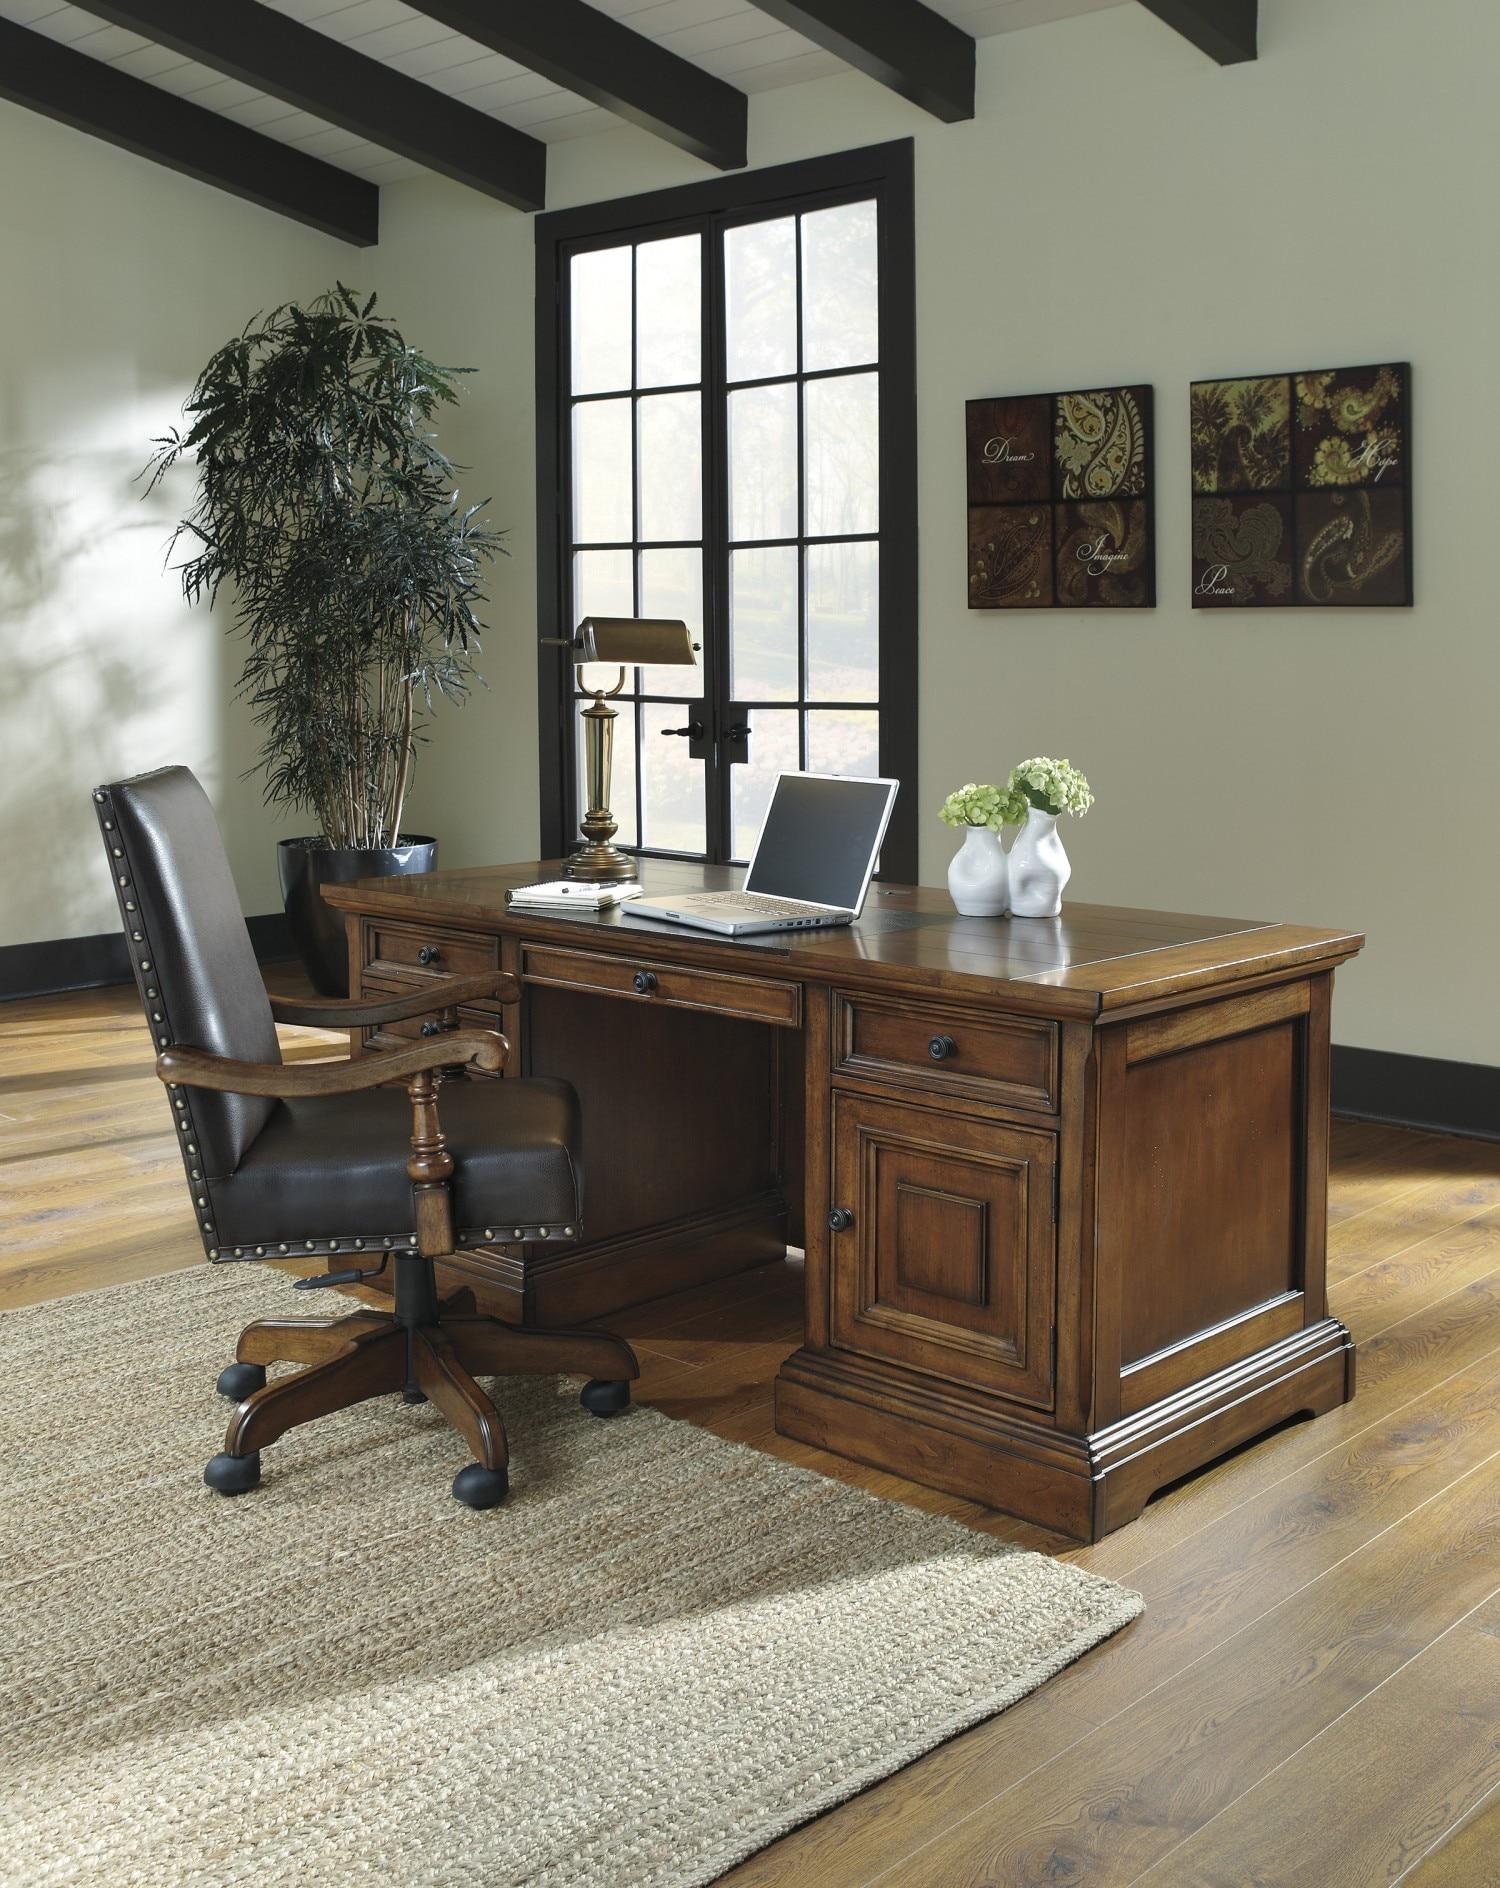 office organization furniture. Make It Work: Get Organized \u0026 Be More Productive Office Organization Furniture